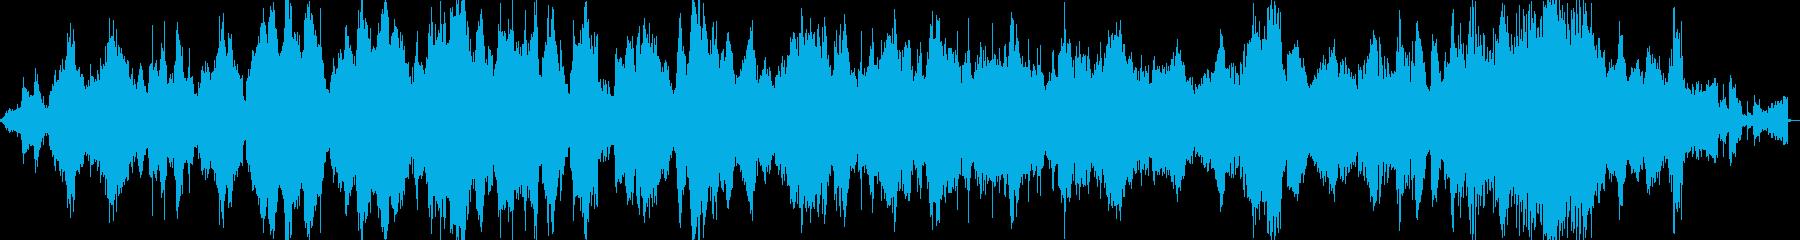 EDM ダウンテンポ かっこいいドロー…の再生済みの波形